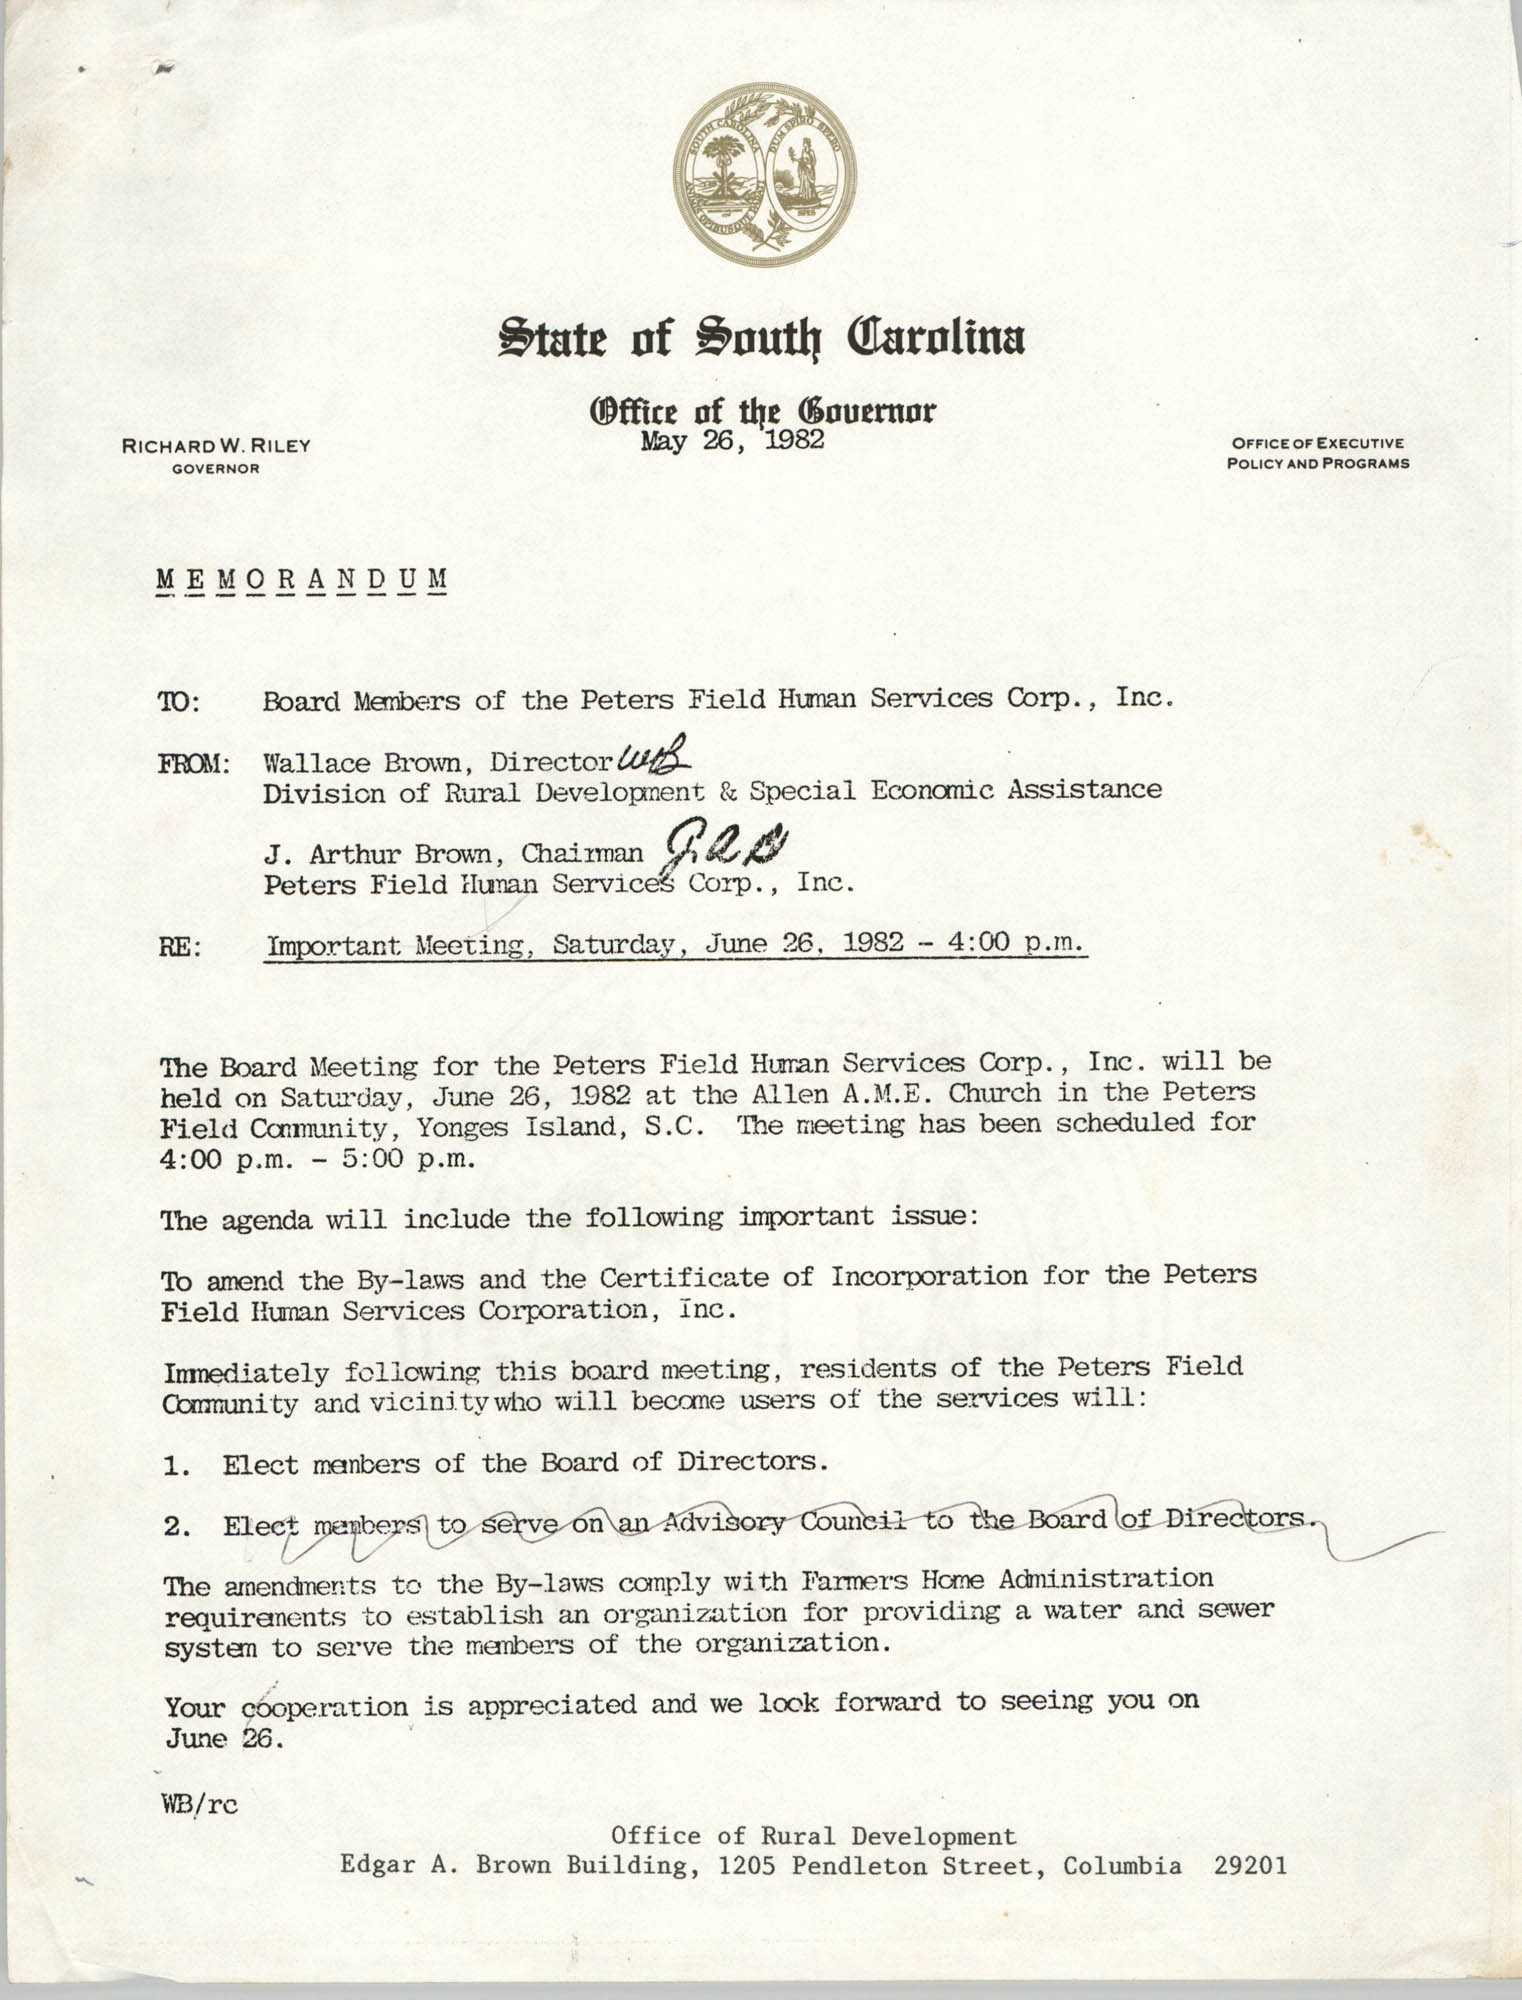 State of South Carolina, Office of the Governor, Memorandum, May 26, 1982